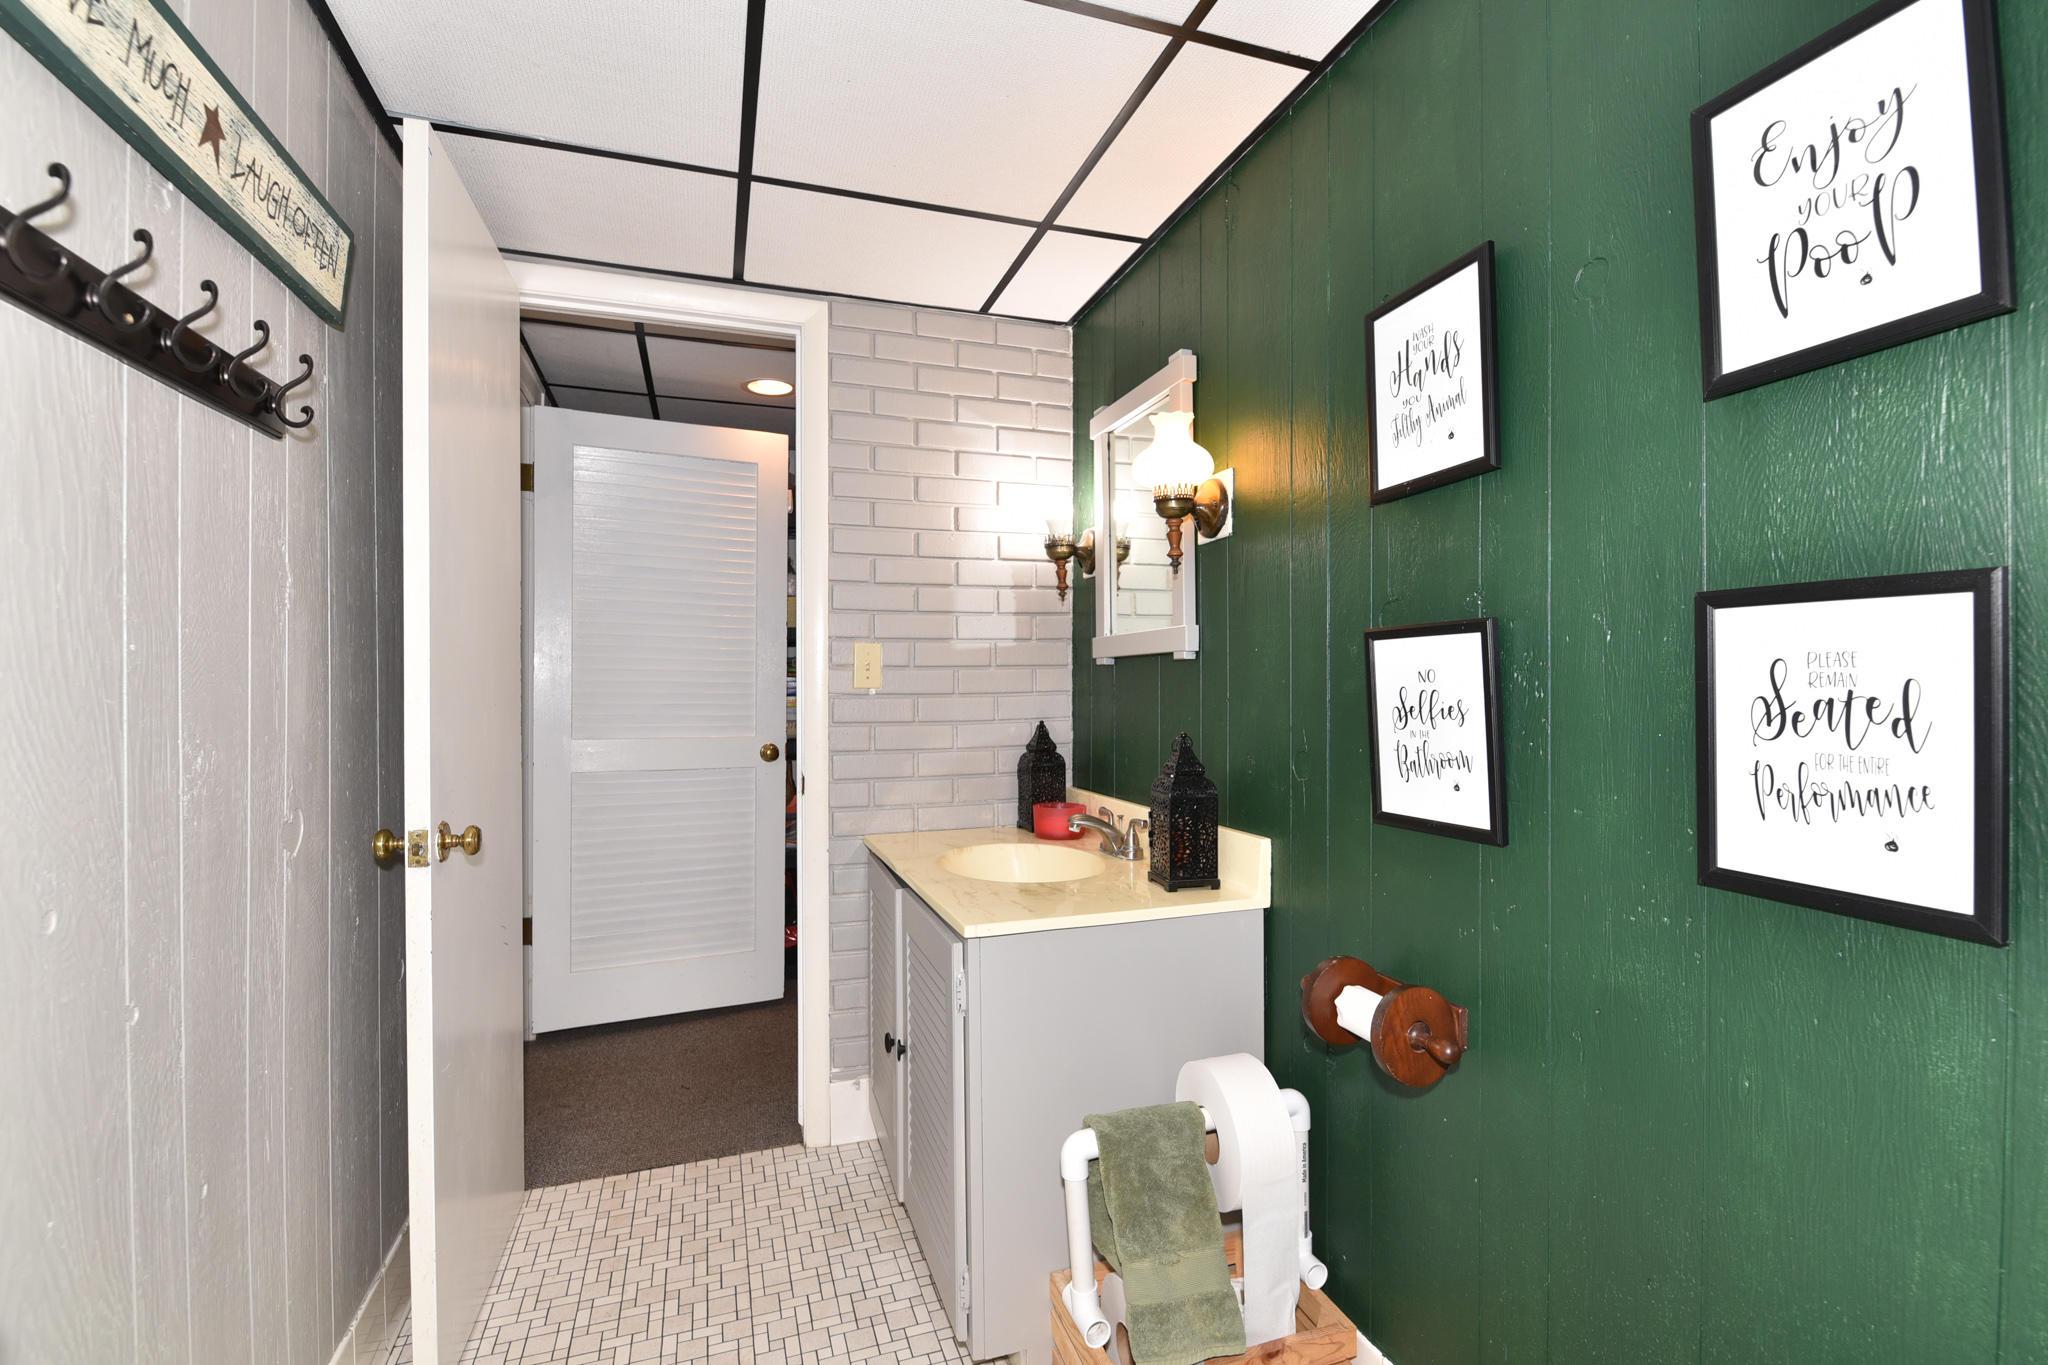 Lower level half bathroom